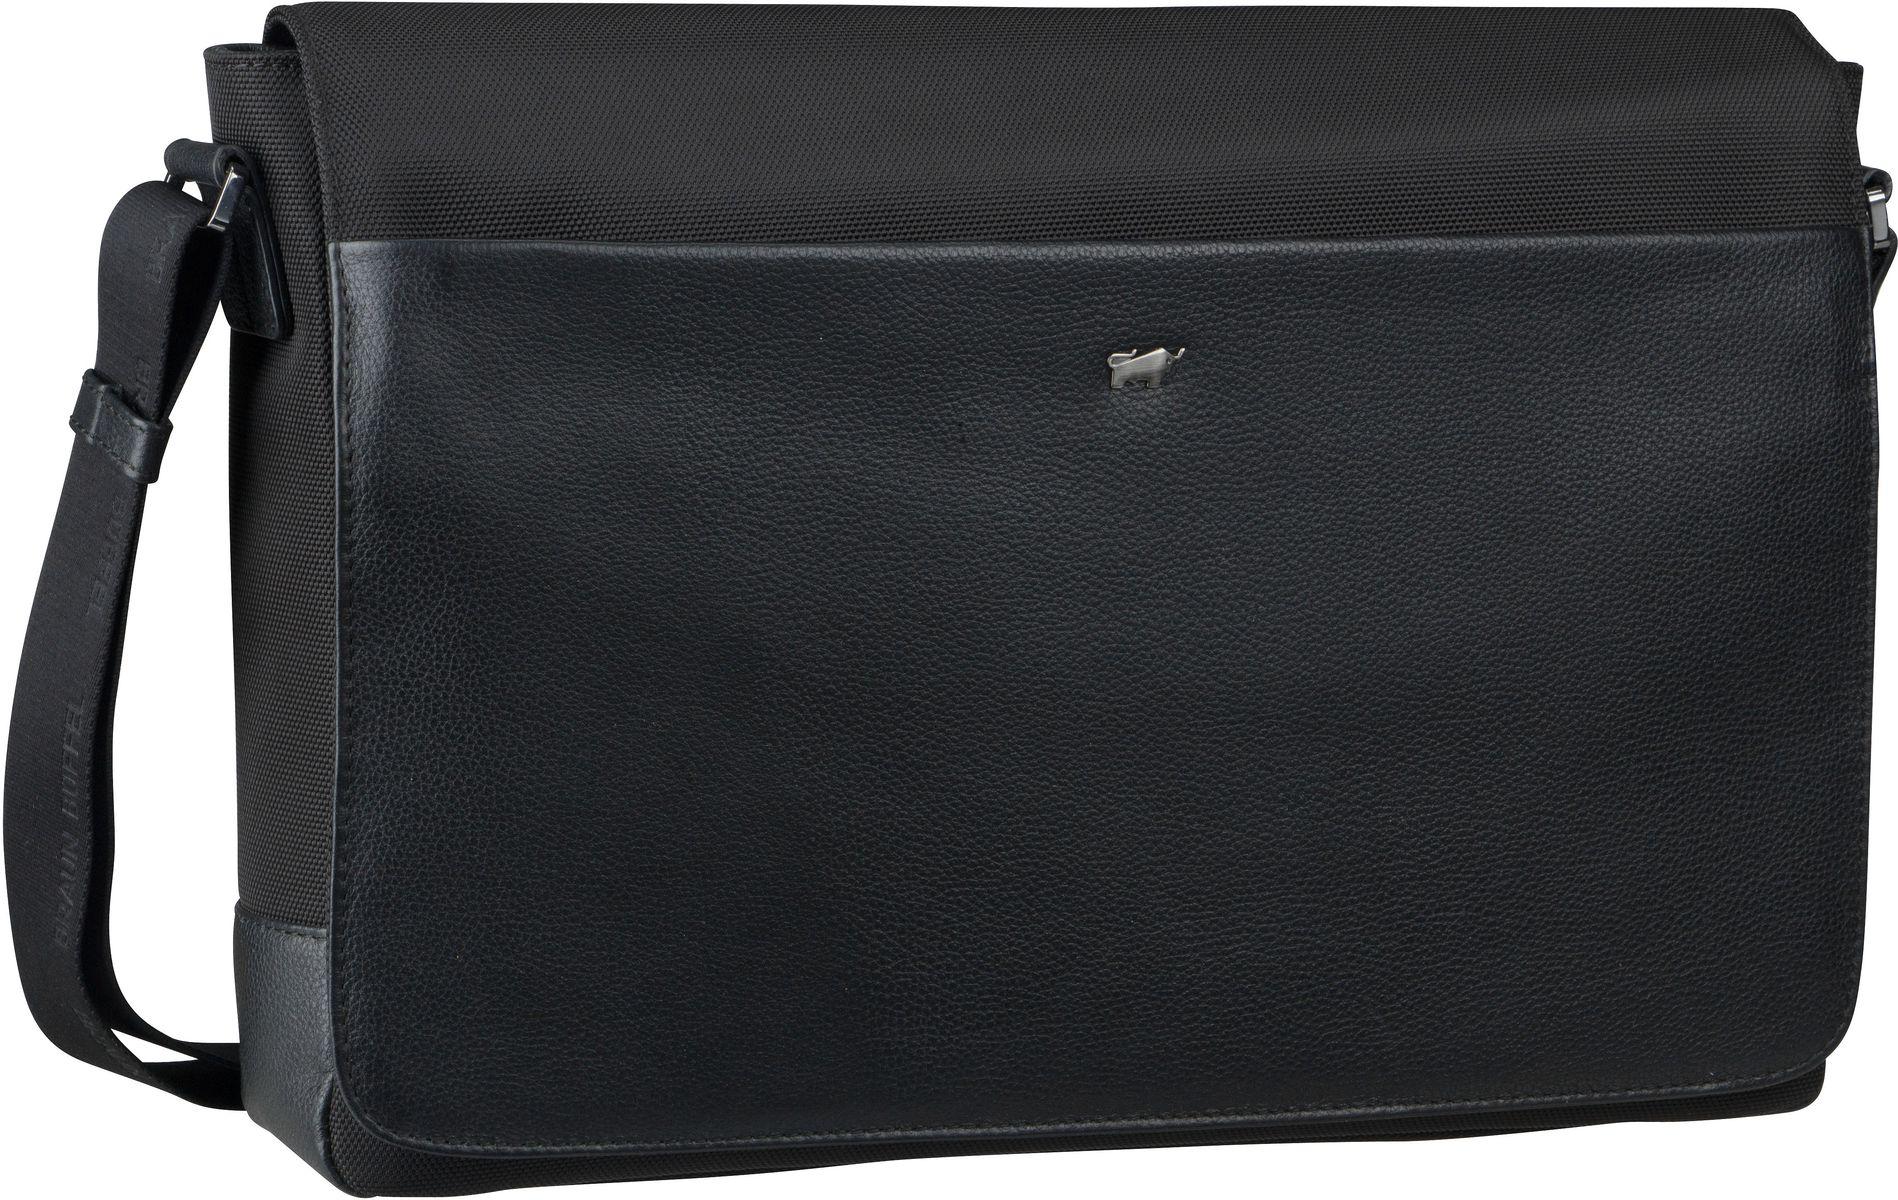 Umhängetasche Murano 14368 Messenger Bag Schwarz